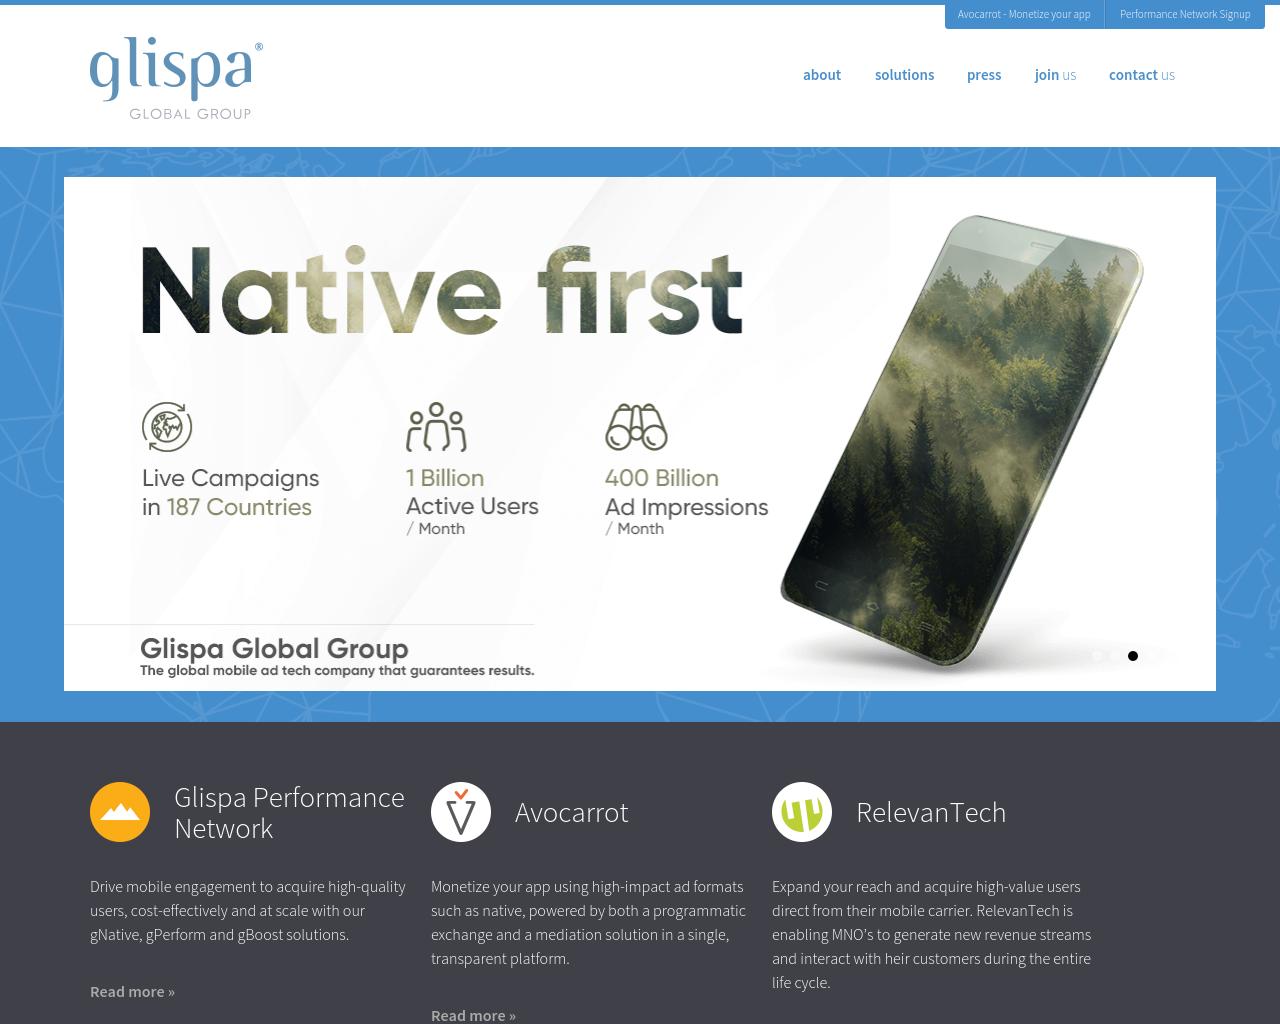 Glispa-Advertising-Reviews-Pricing